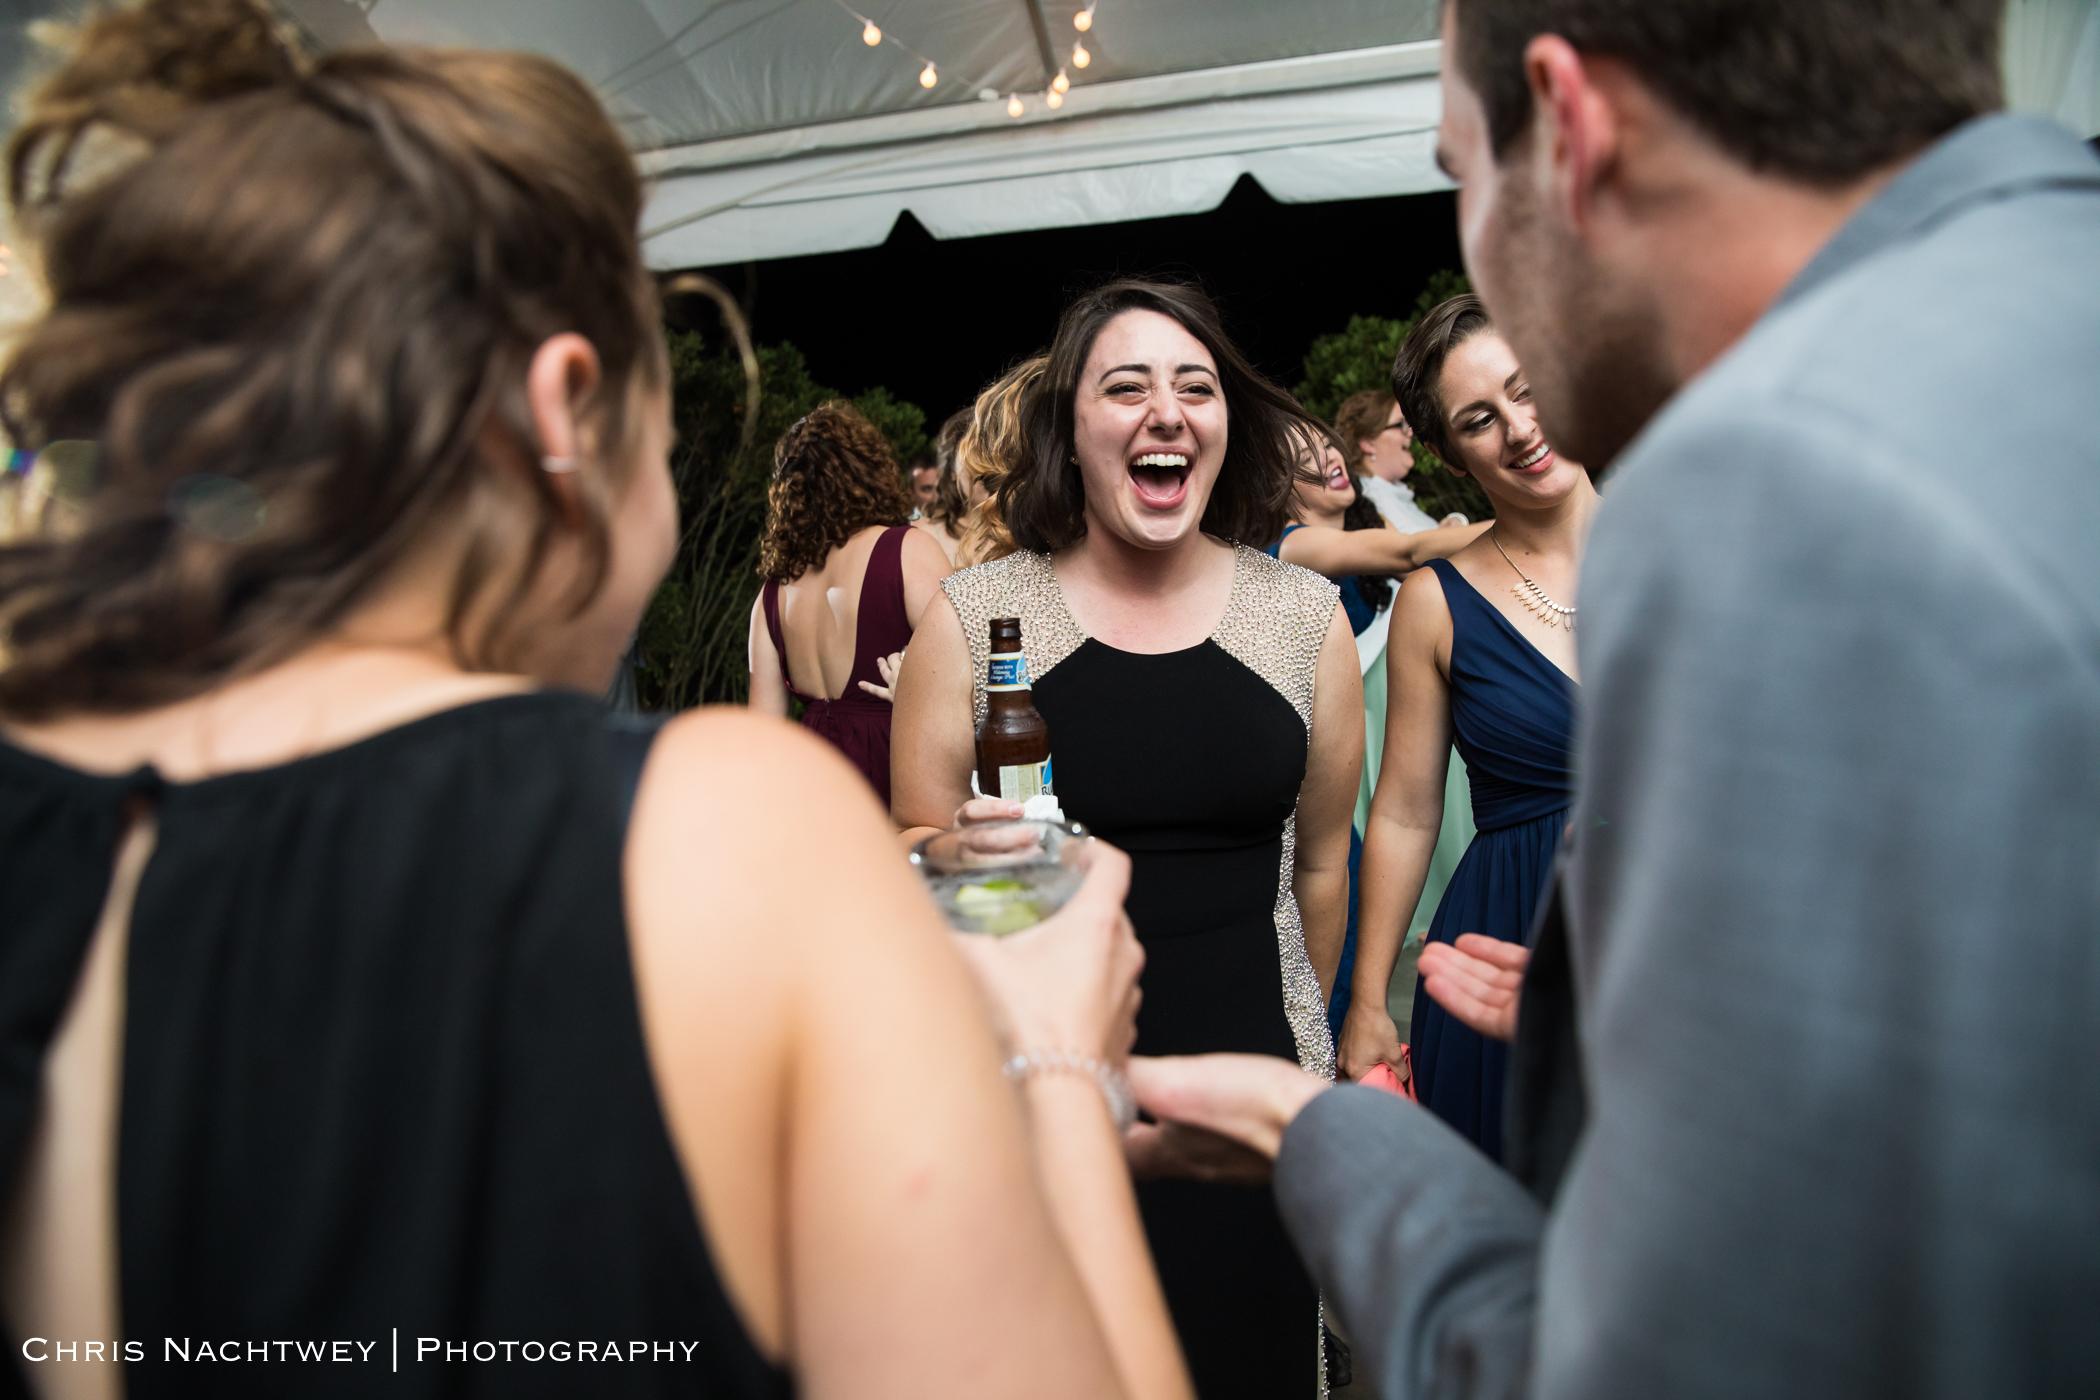 harkness-wedding-photos-chris-nachtwey-photography-2018-42.jpg